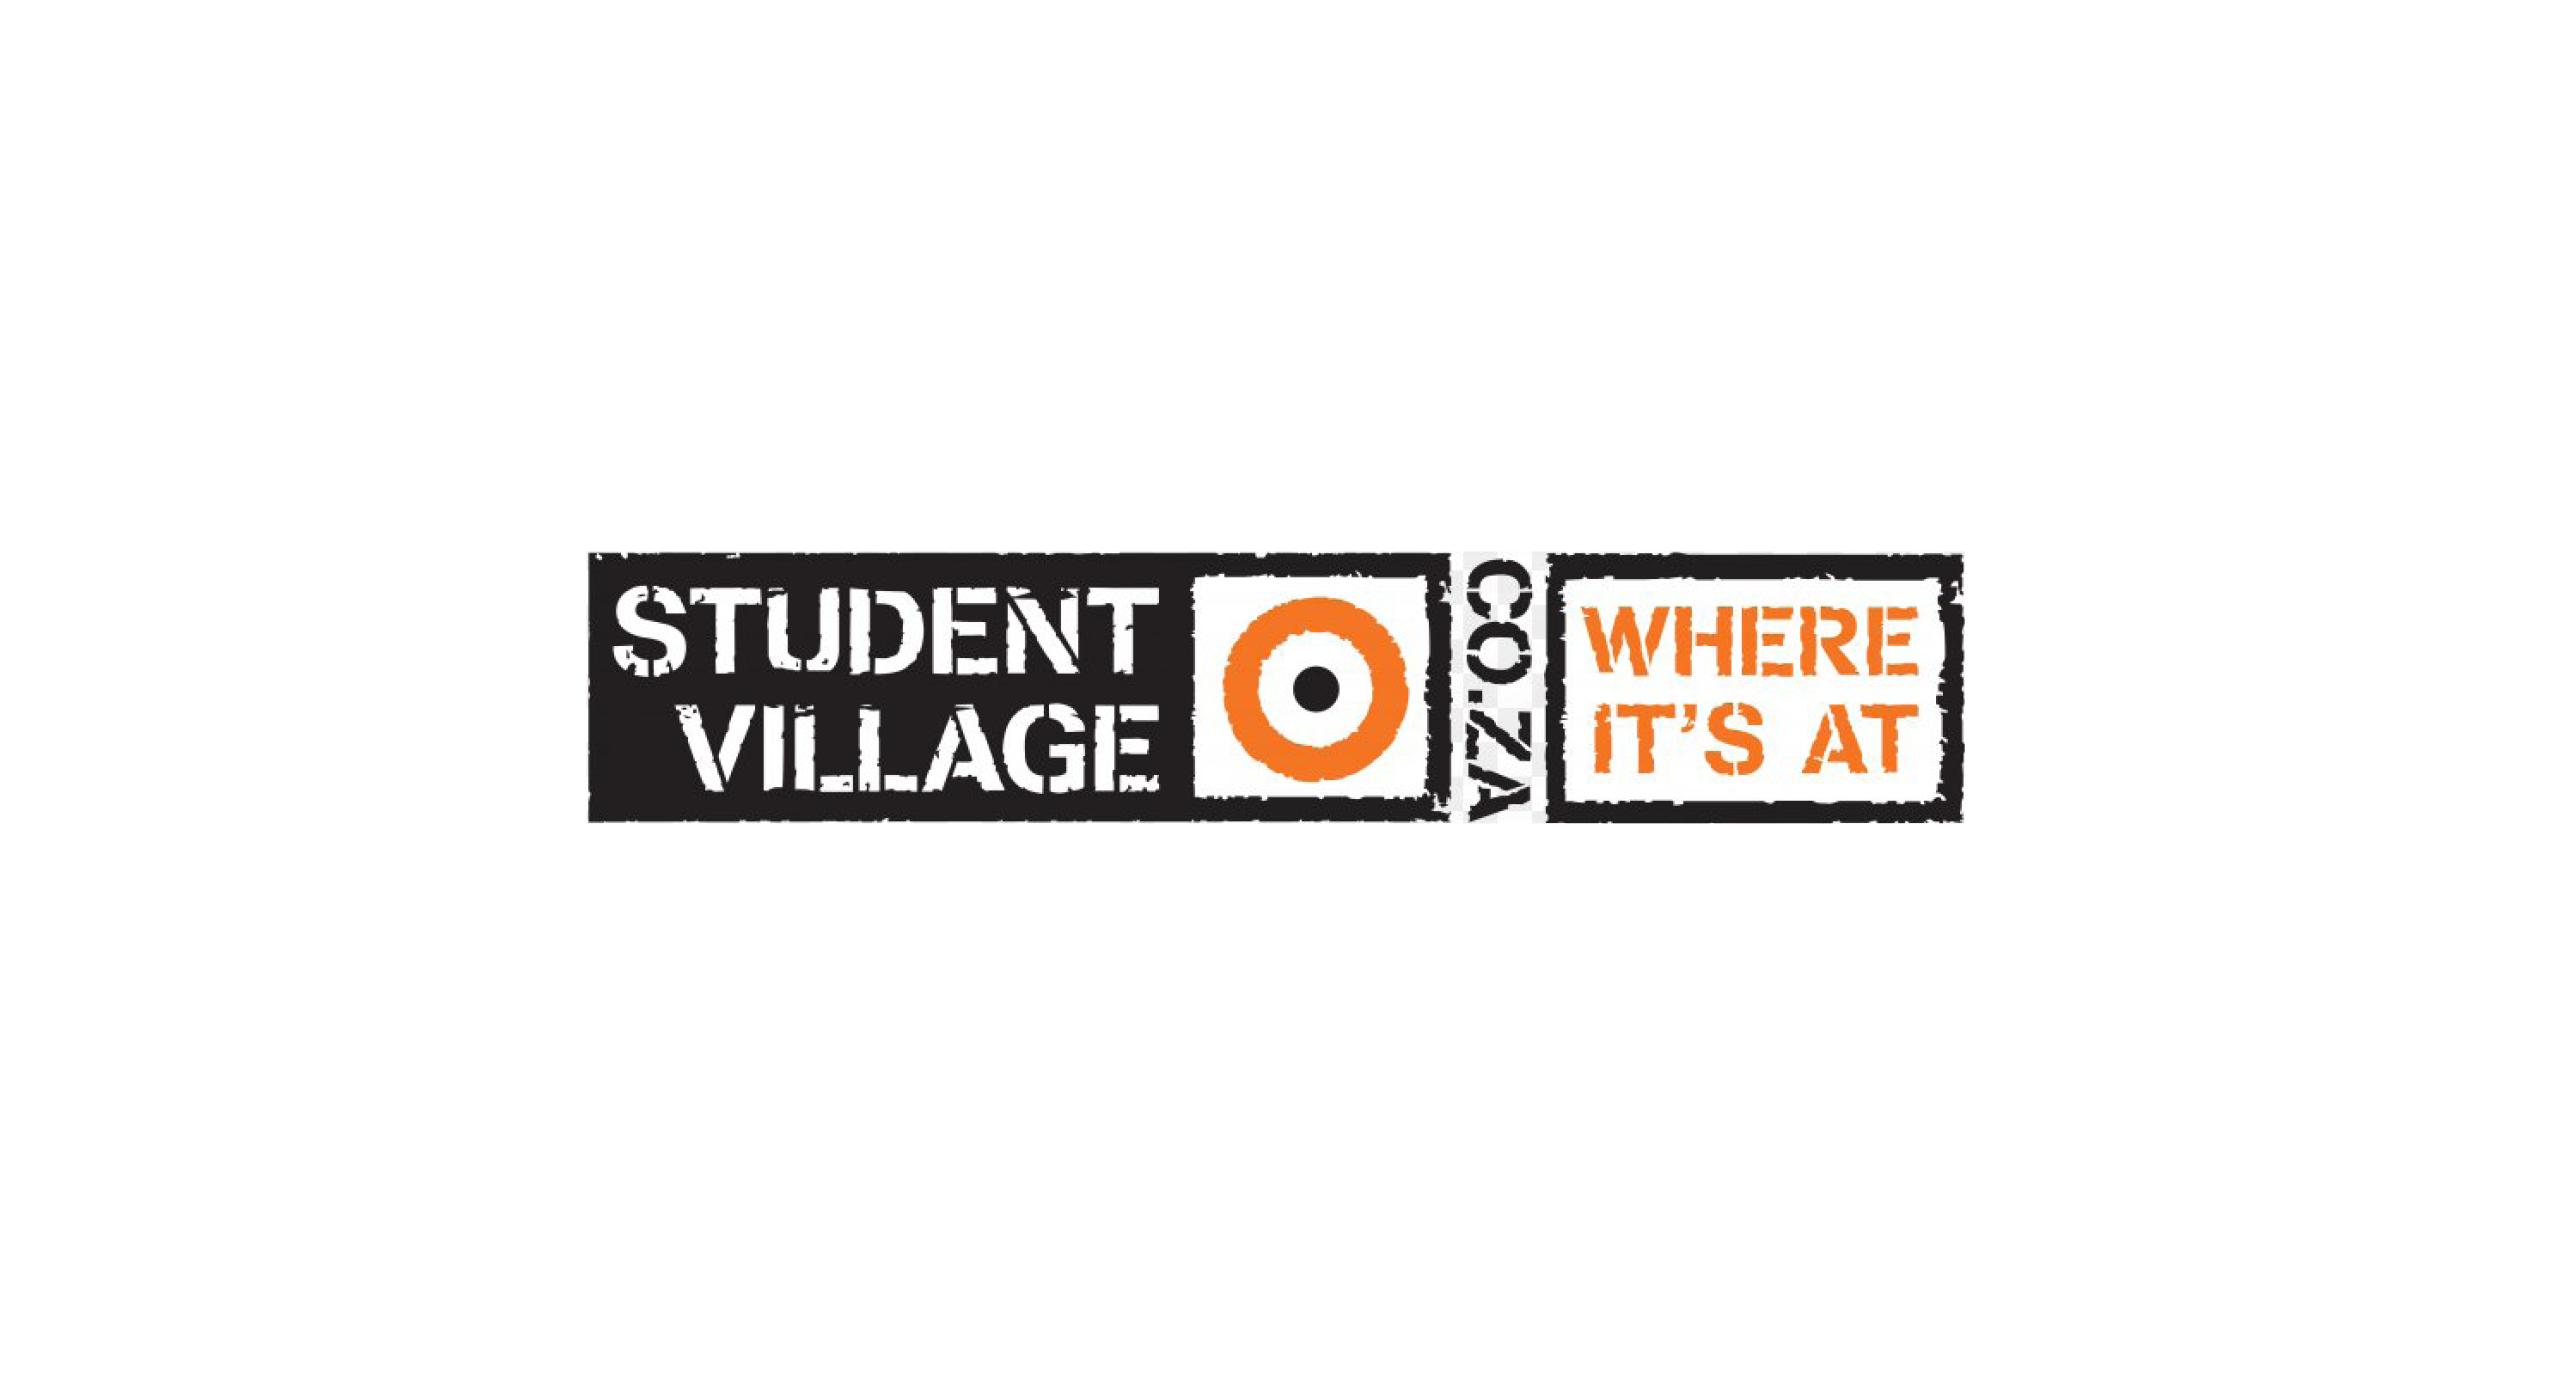 Student Village logo